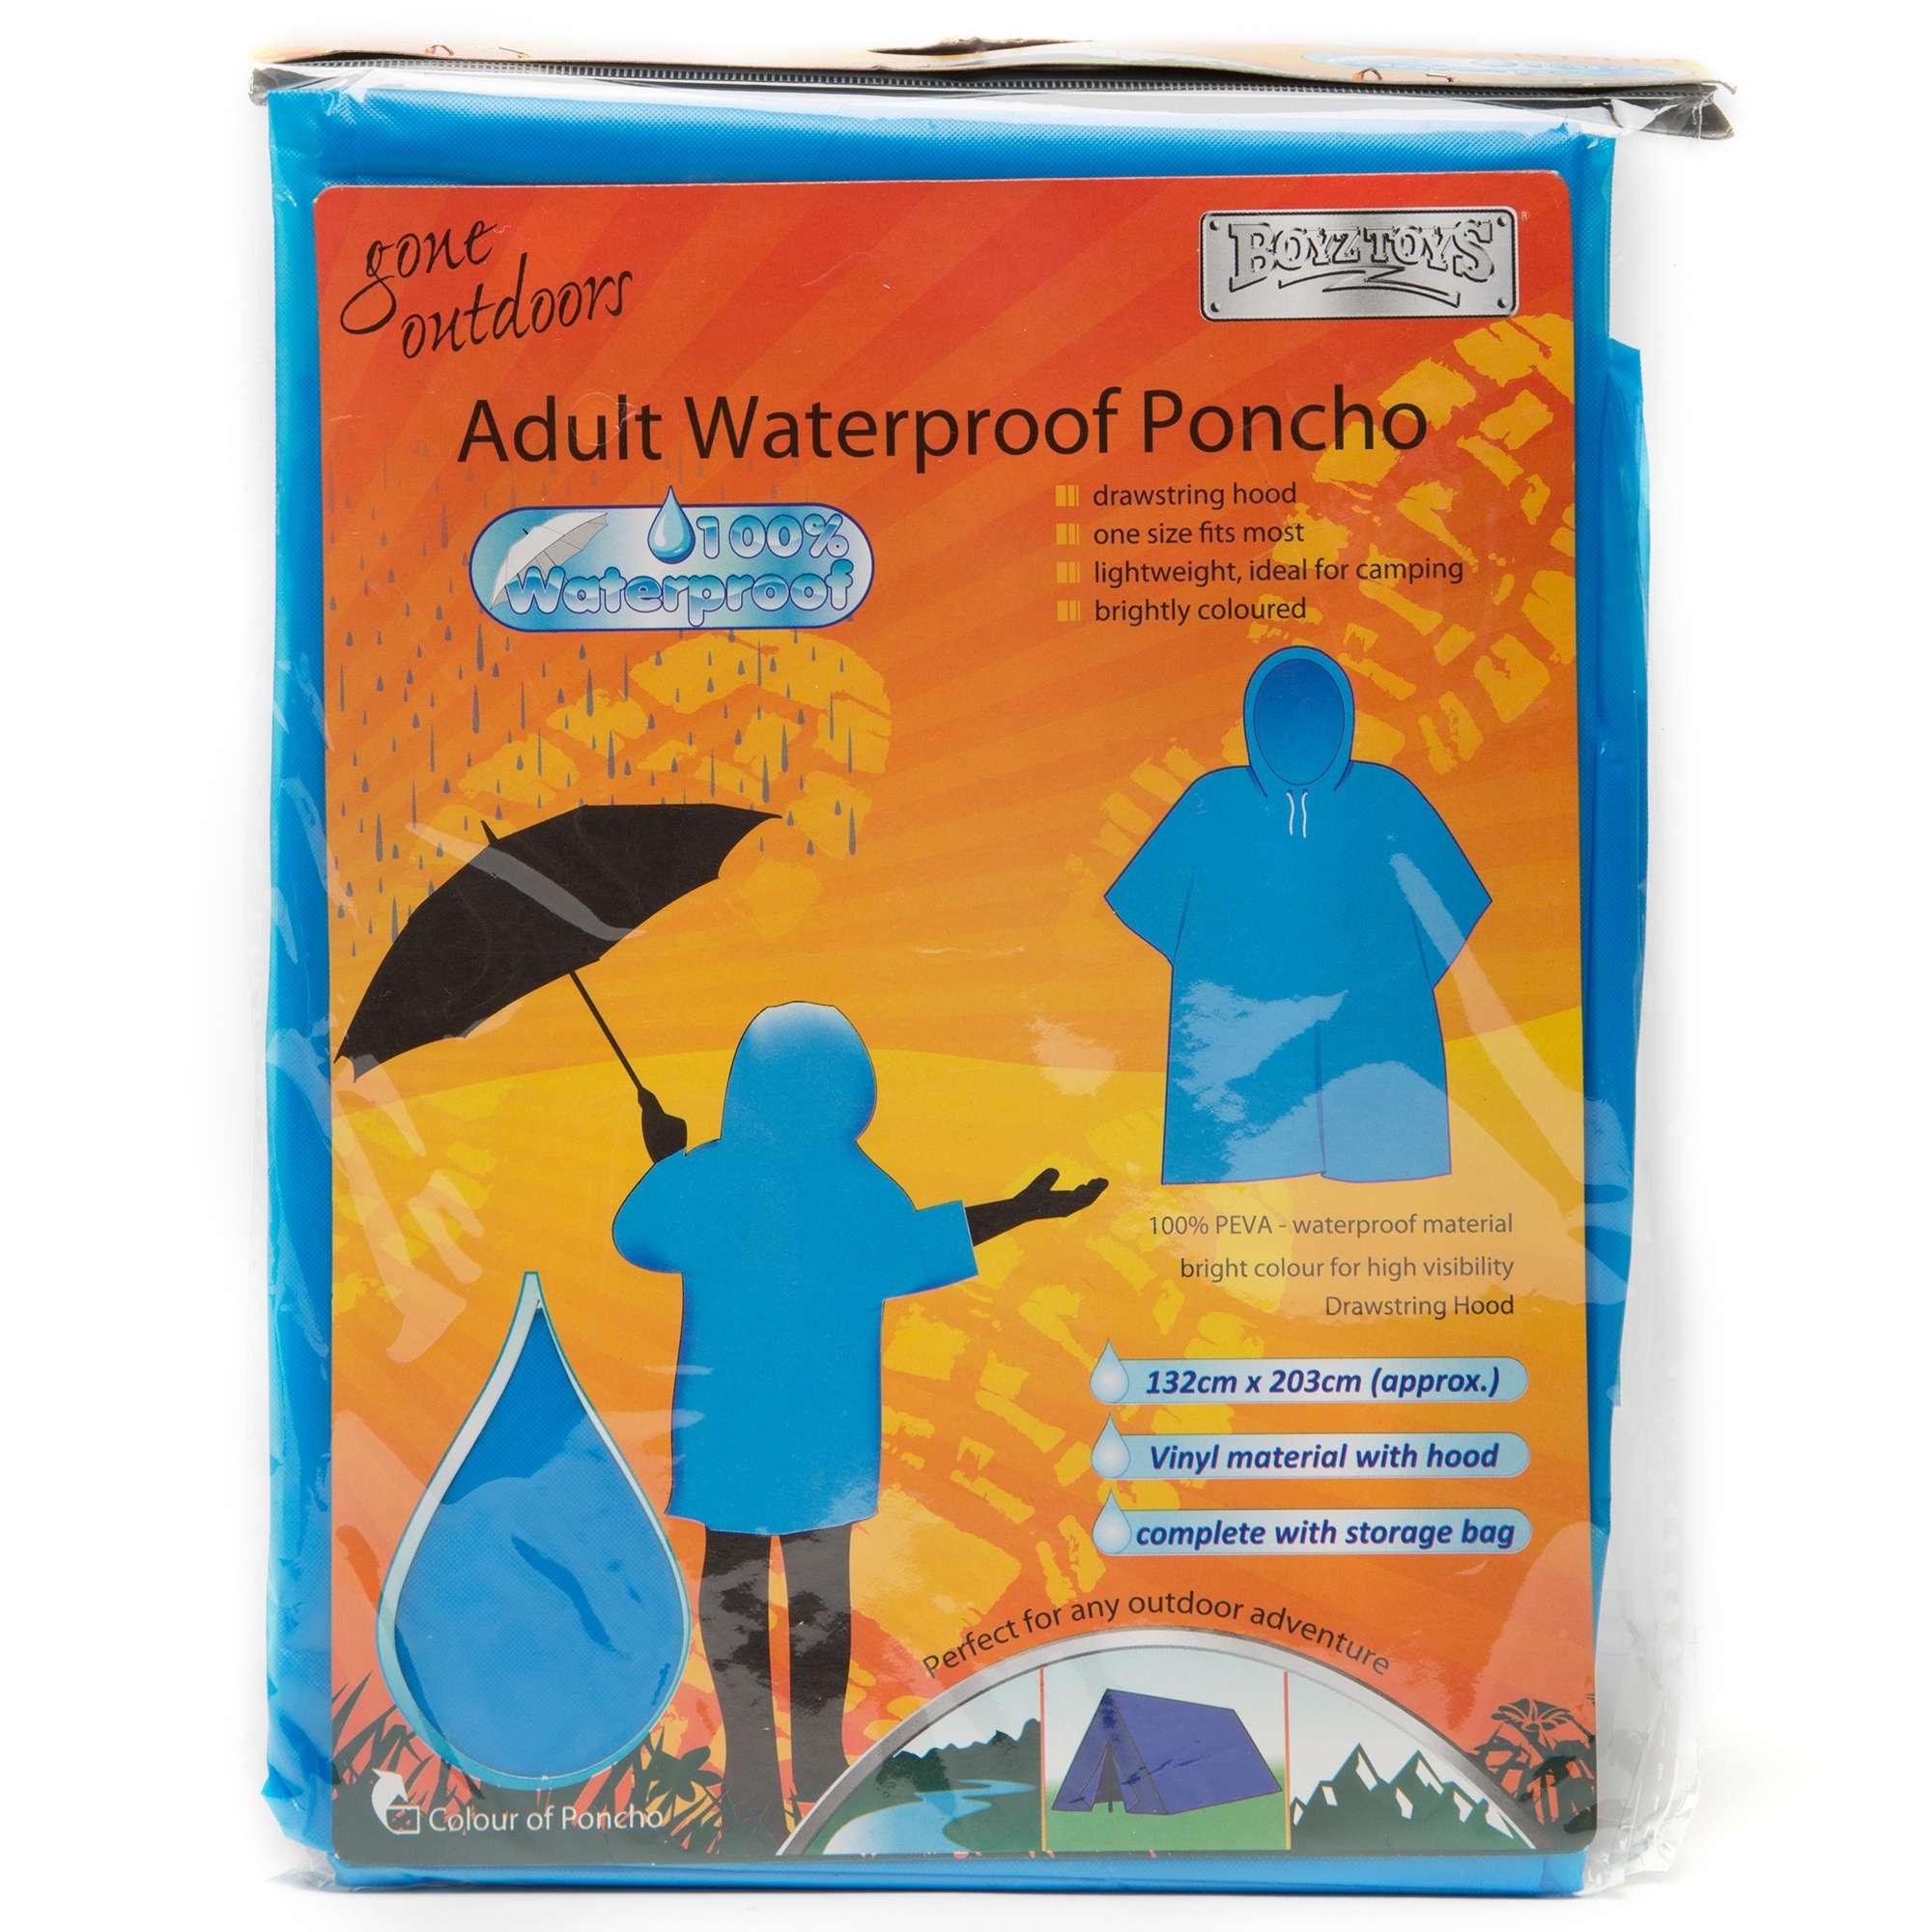 BOYZ TOYS Adult Waterproof Poncho